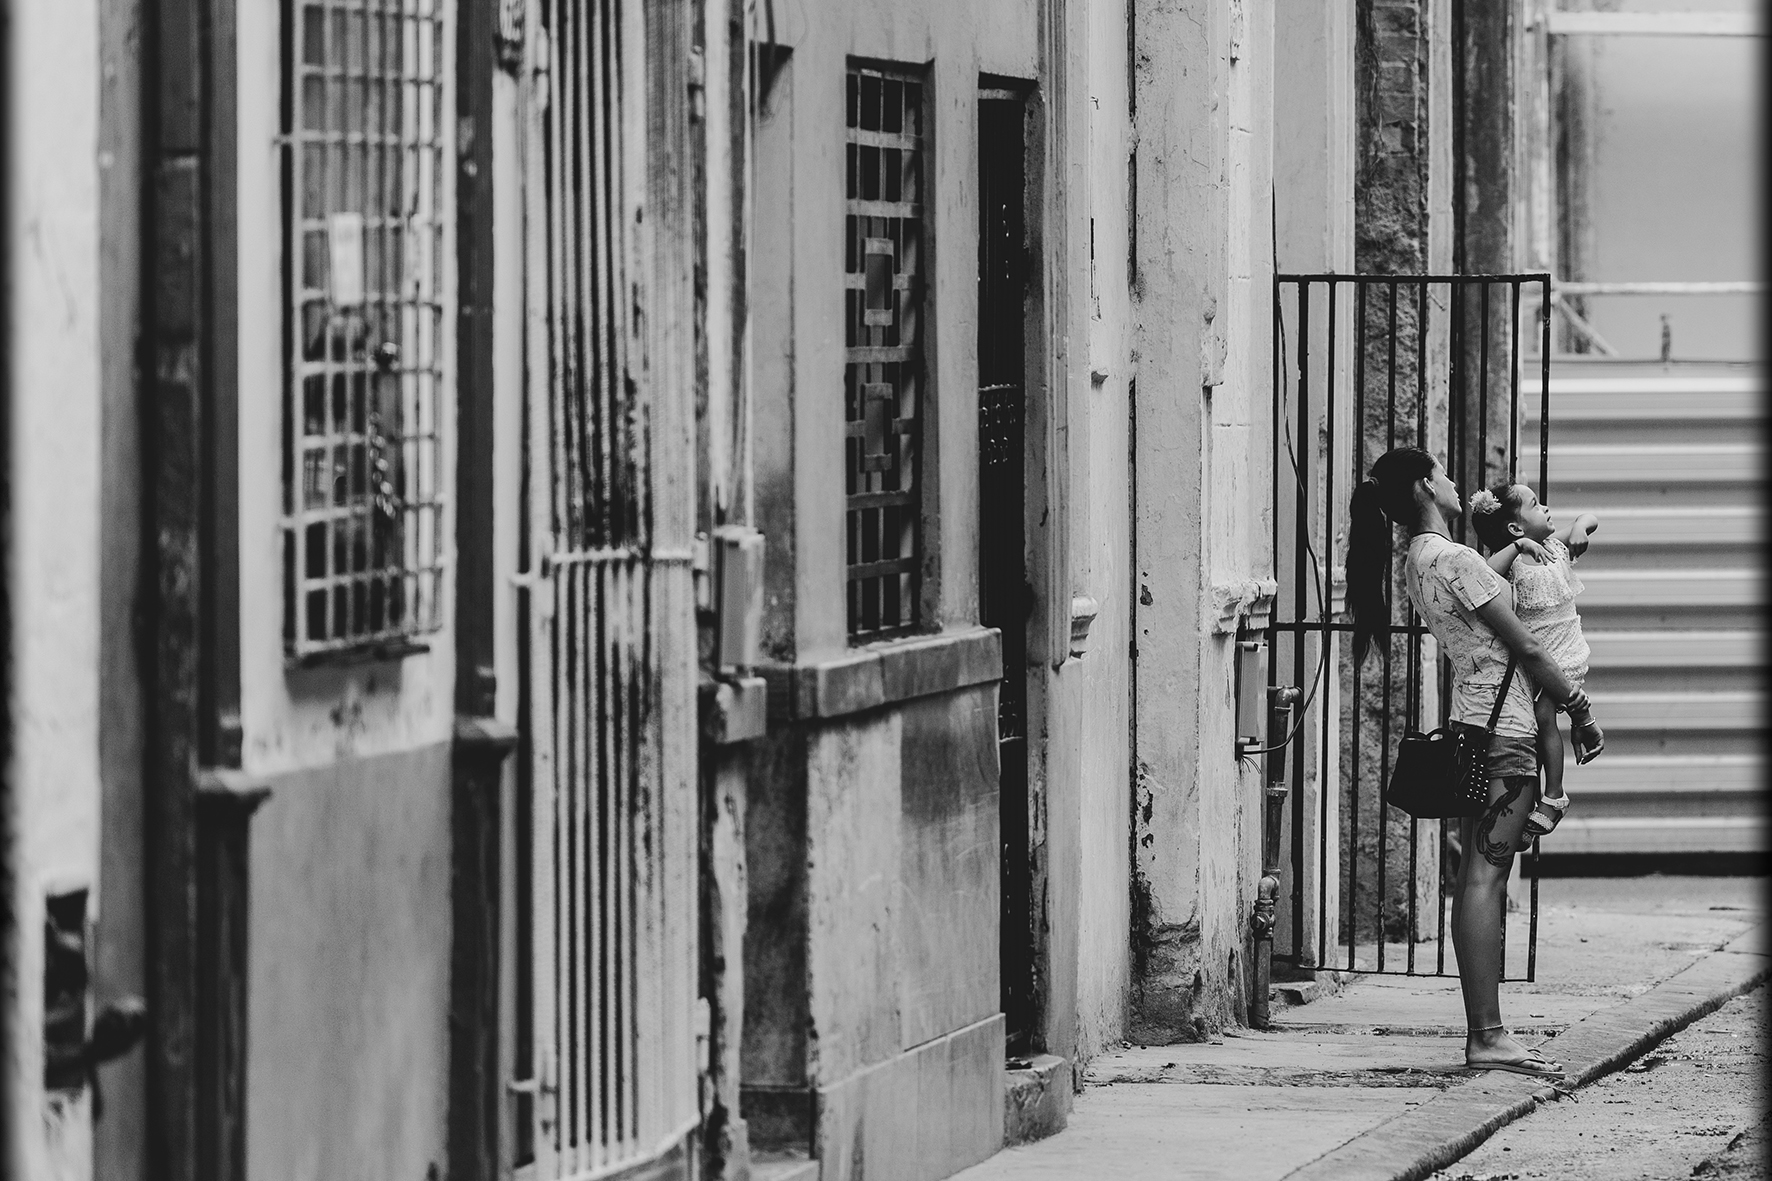 Photographe : A street show n°1